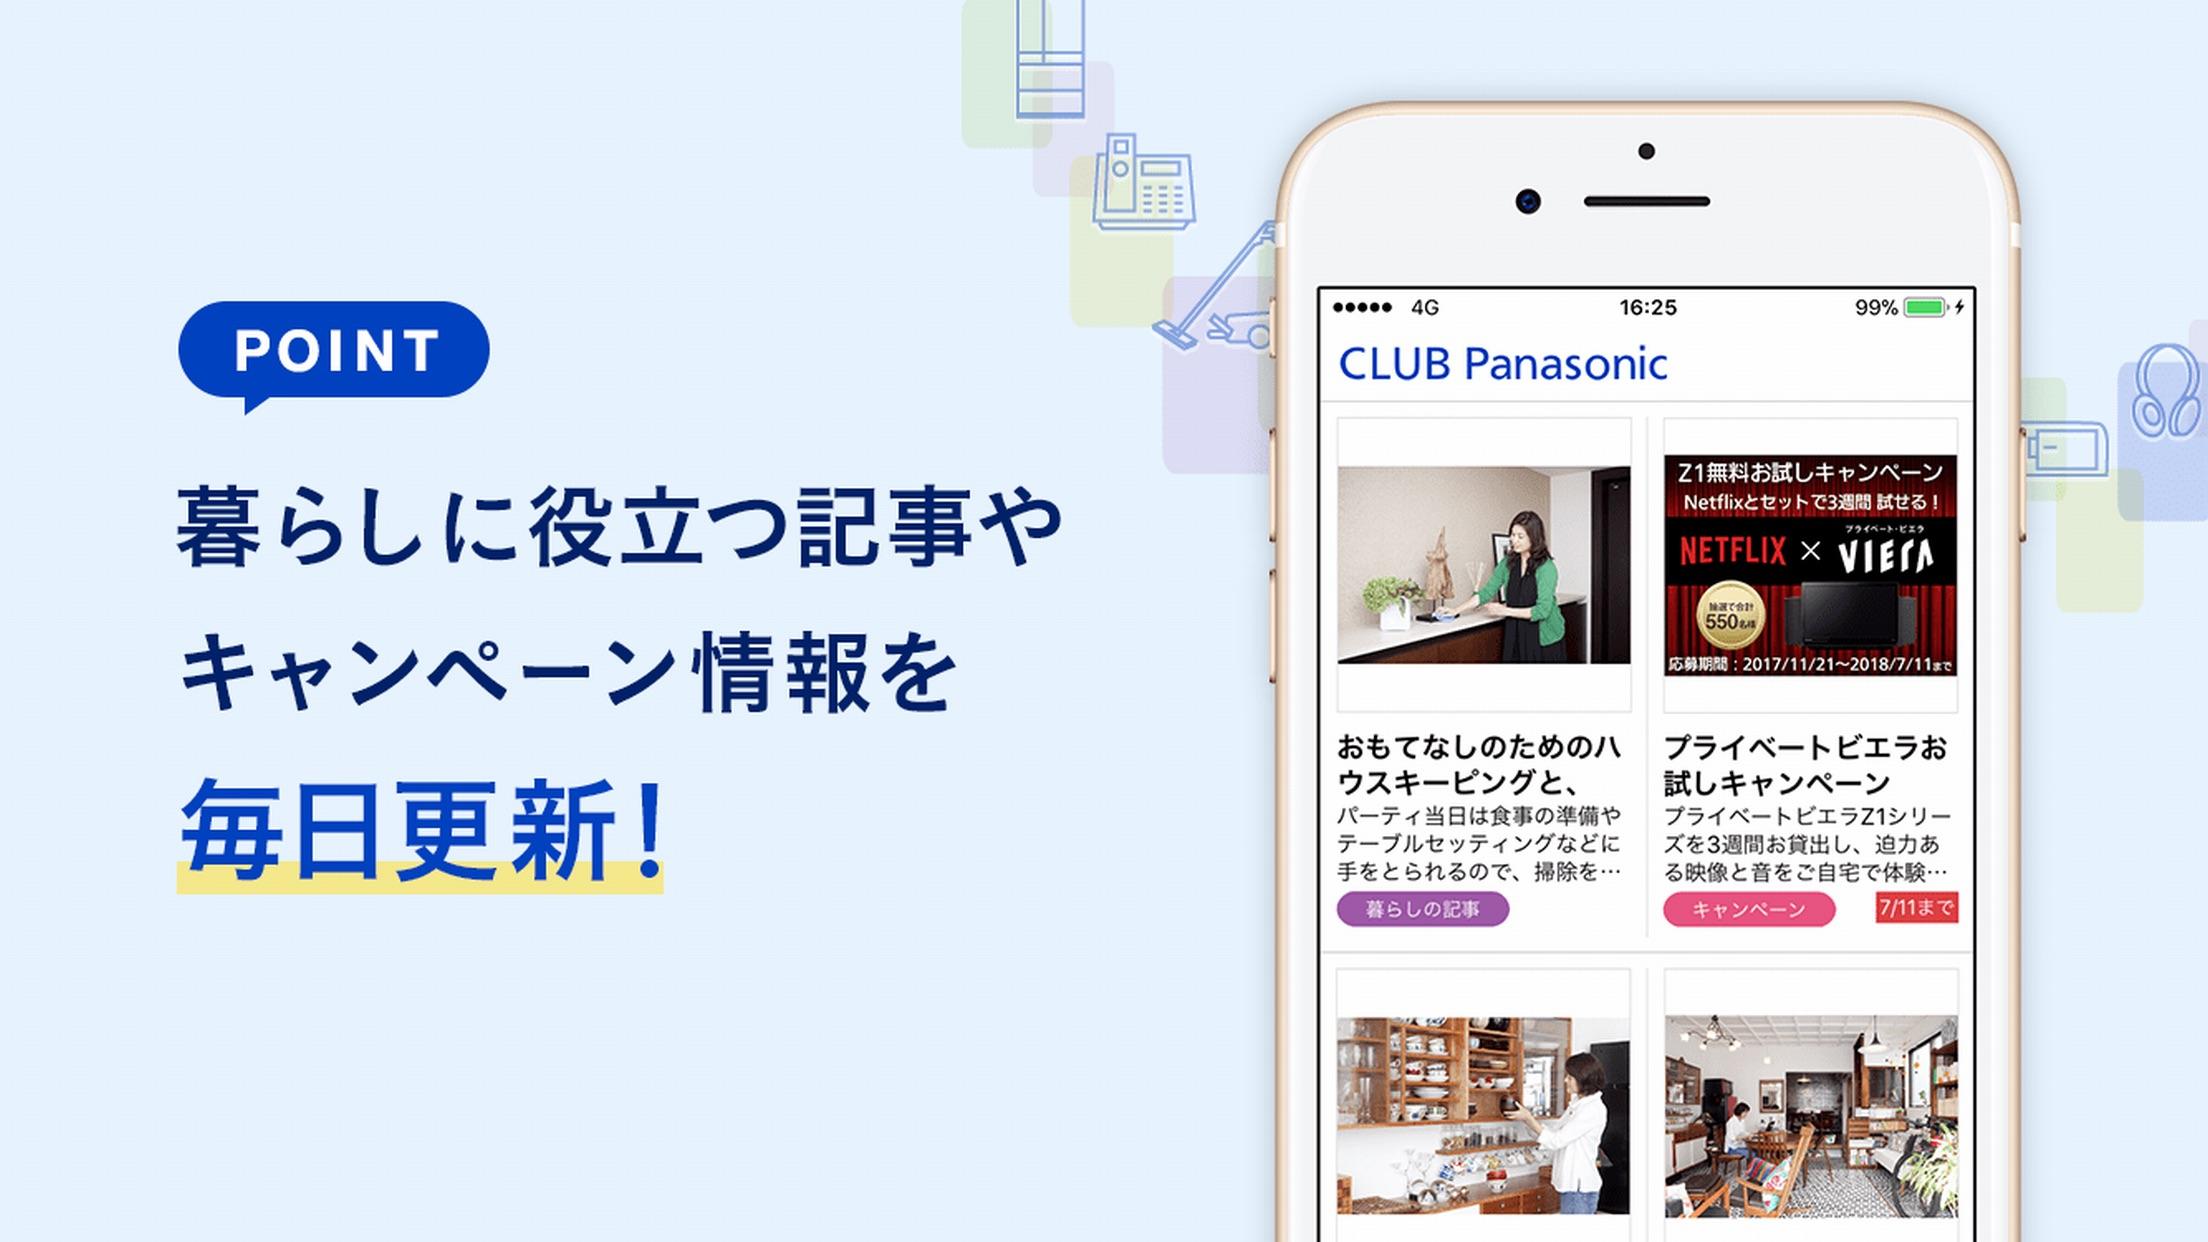 CLUB Panasonic (クラブパナソニック) Screenshot